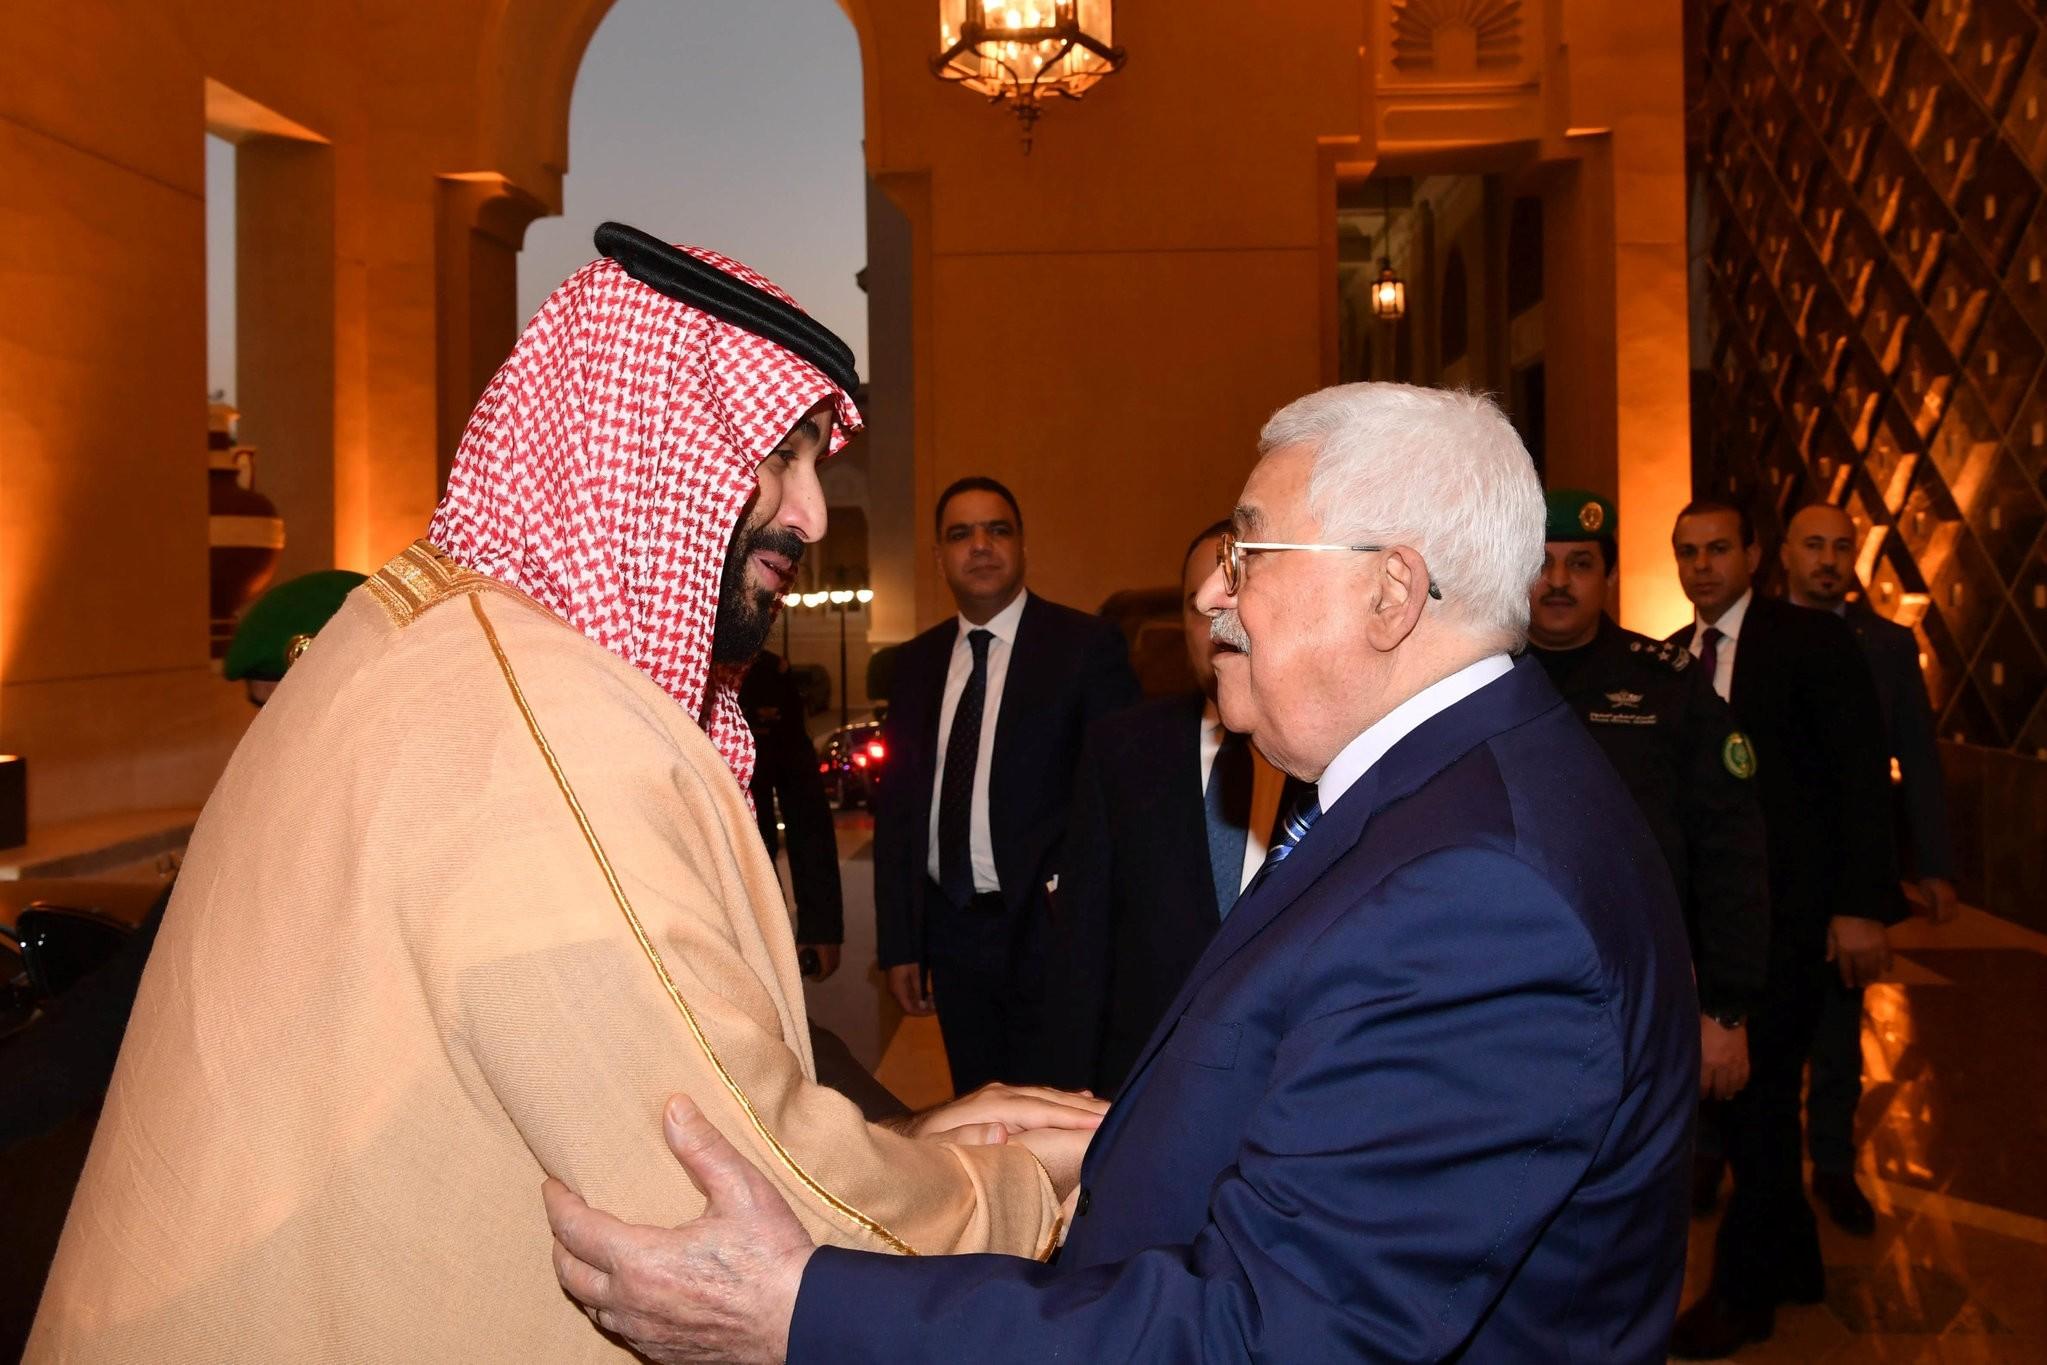 Saudi Arabia's Crown Prince Mohammed Bin Salman welcomes Palestinian President Mahmoud Abbas in Riyadh, Saudi Arabia December 21, 2017. (Reuters Photo)